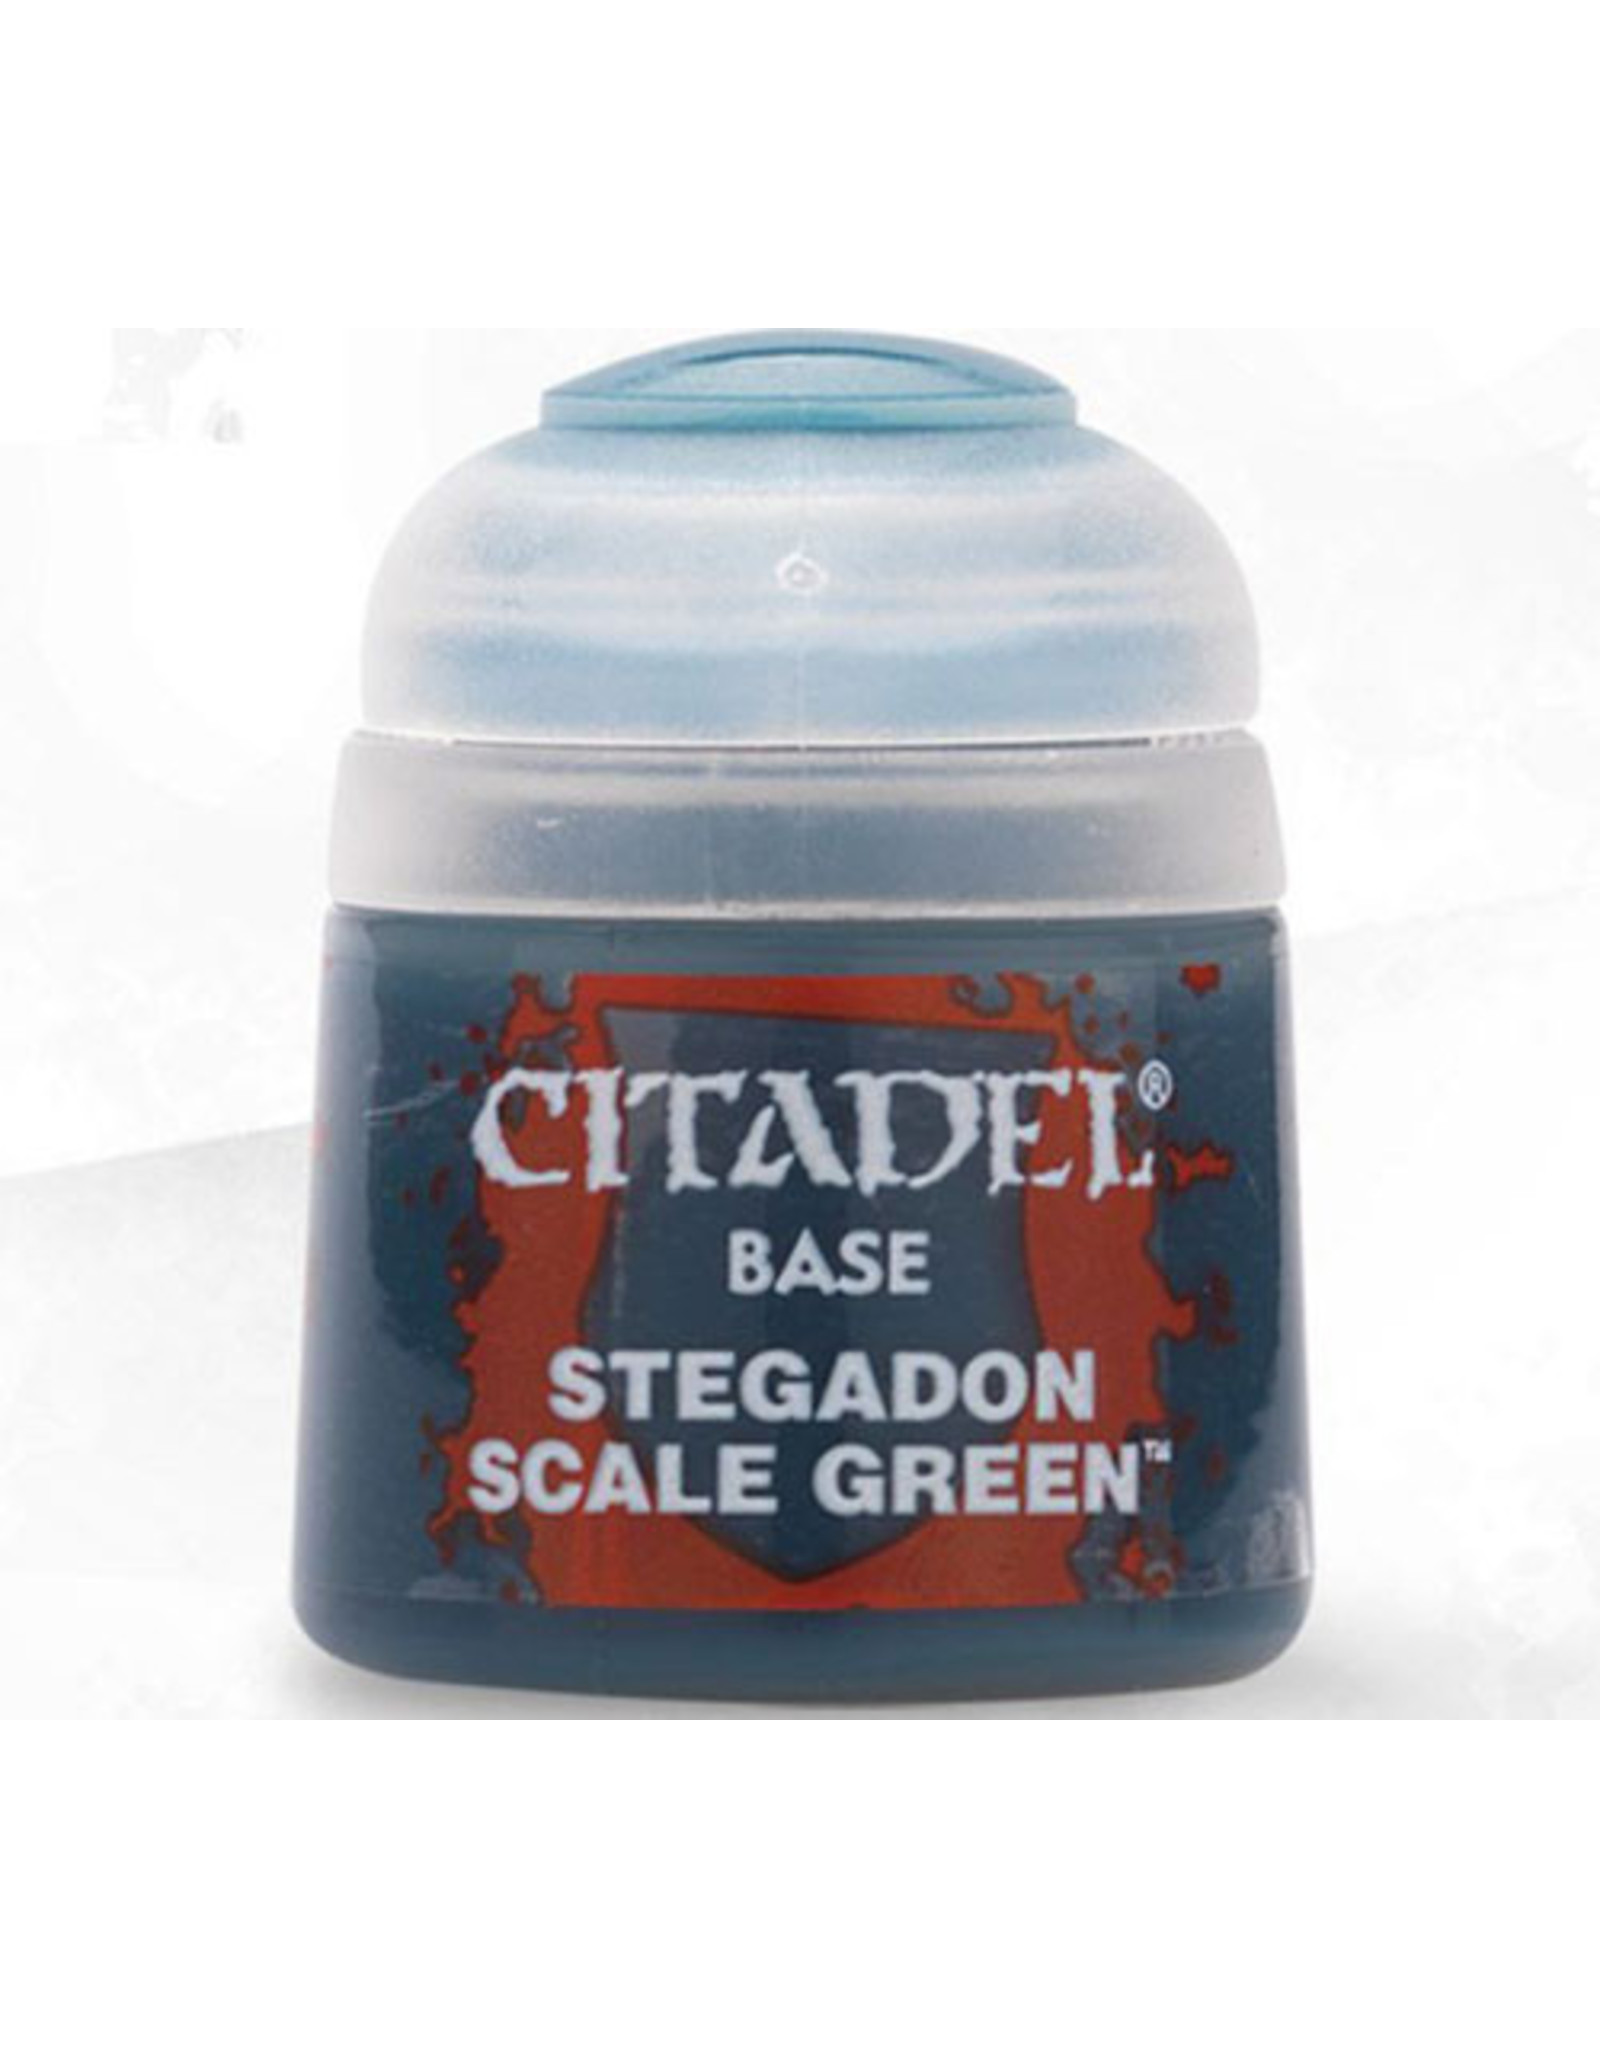 Citadel Citadel Paints: Base - Stegadon Scale Green